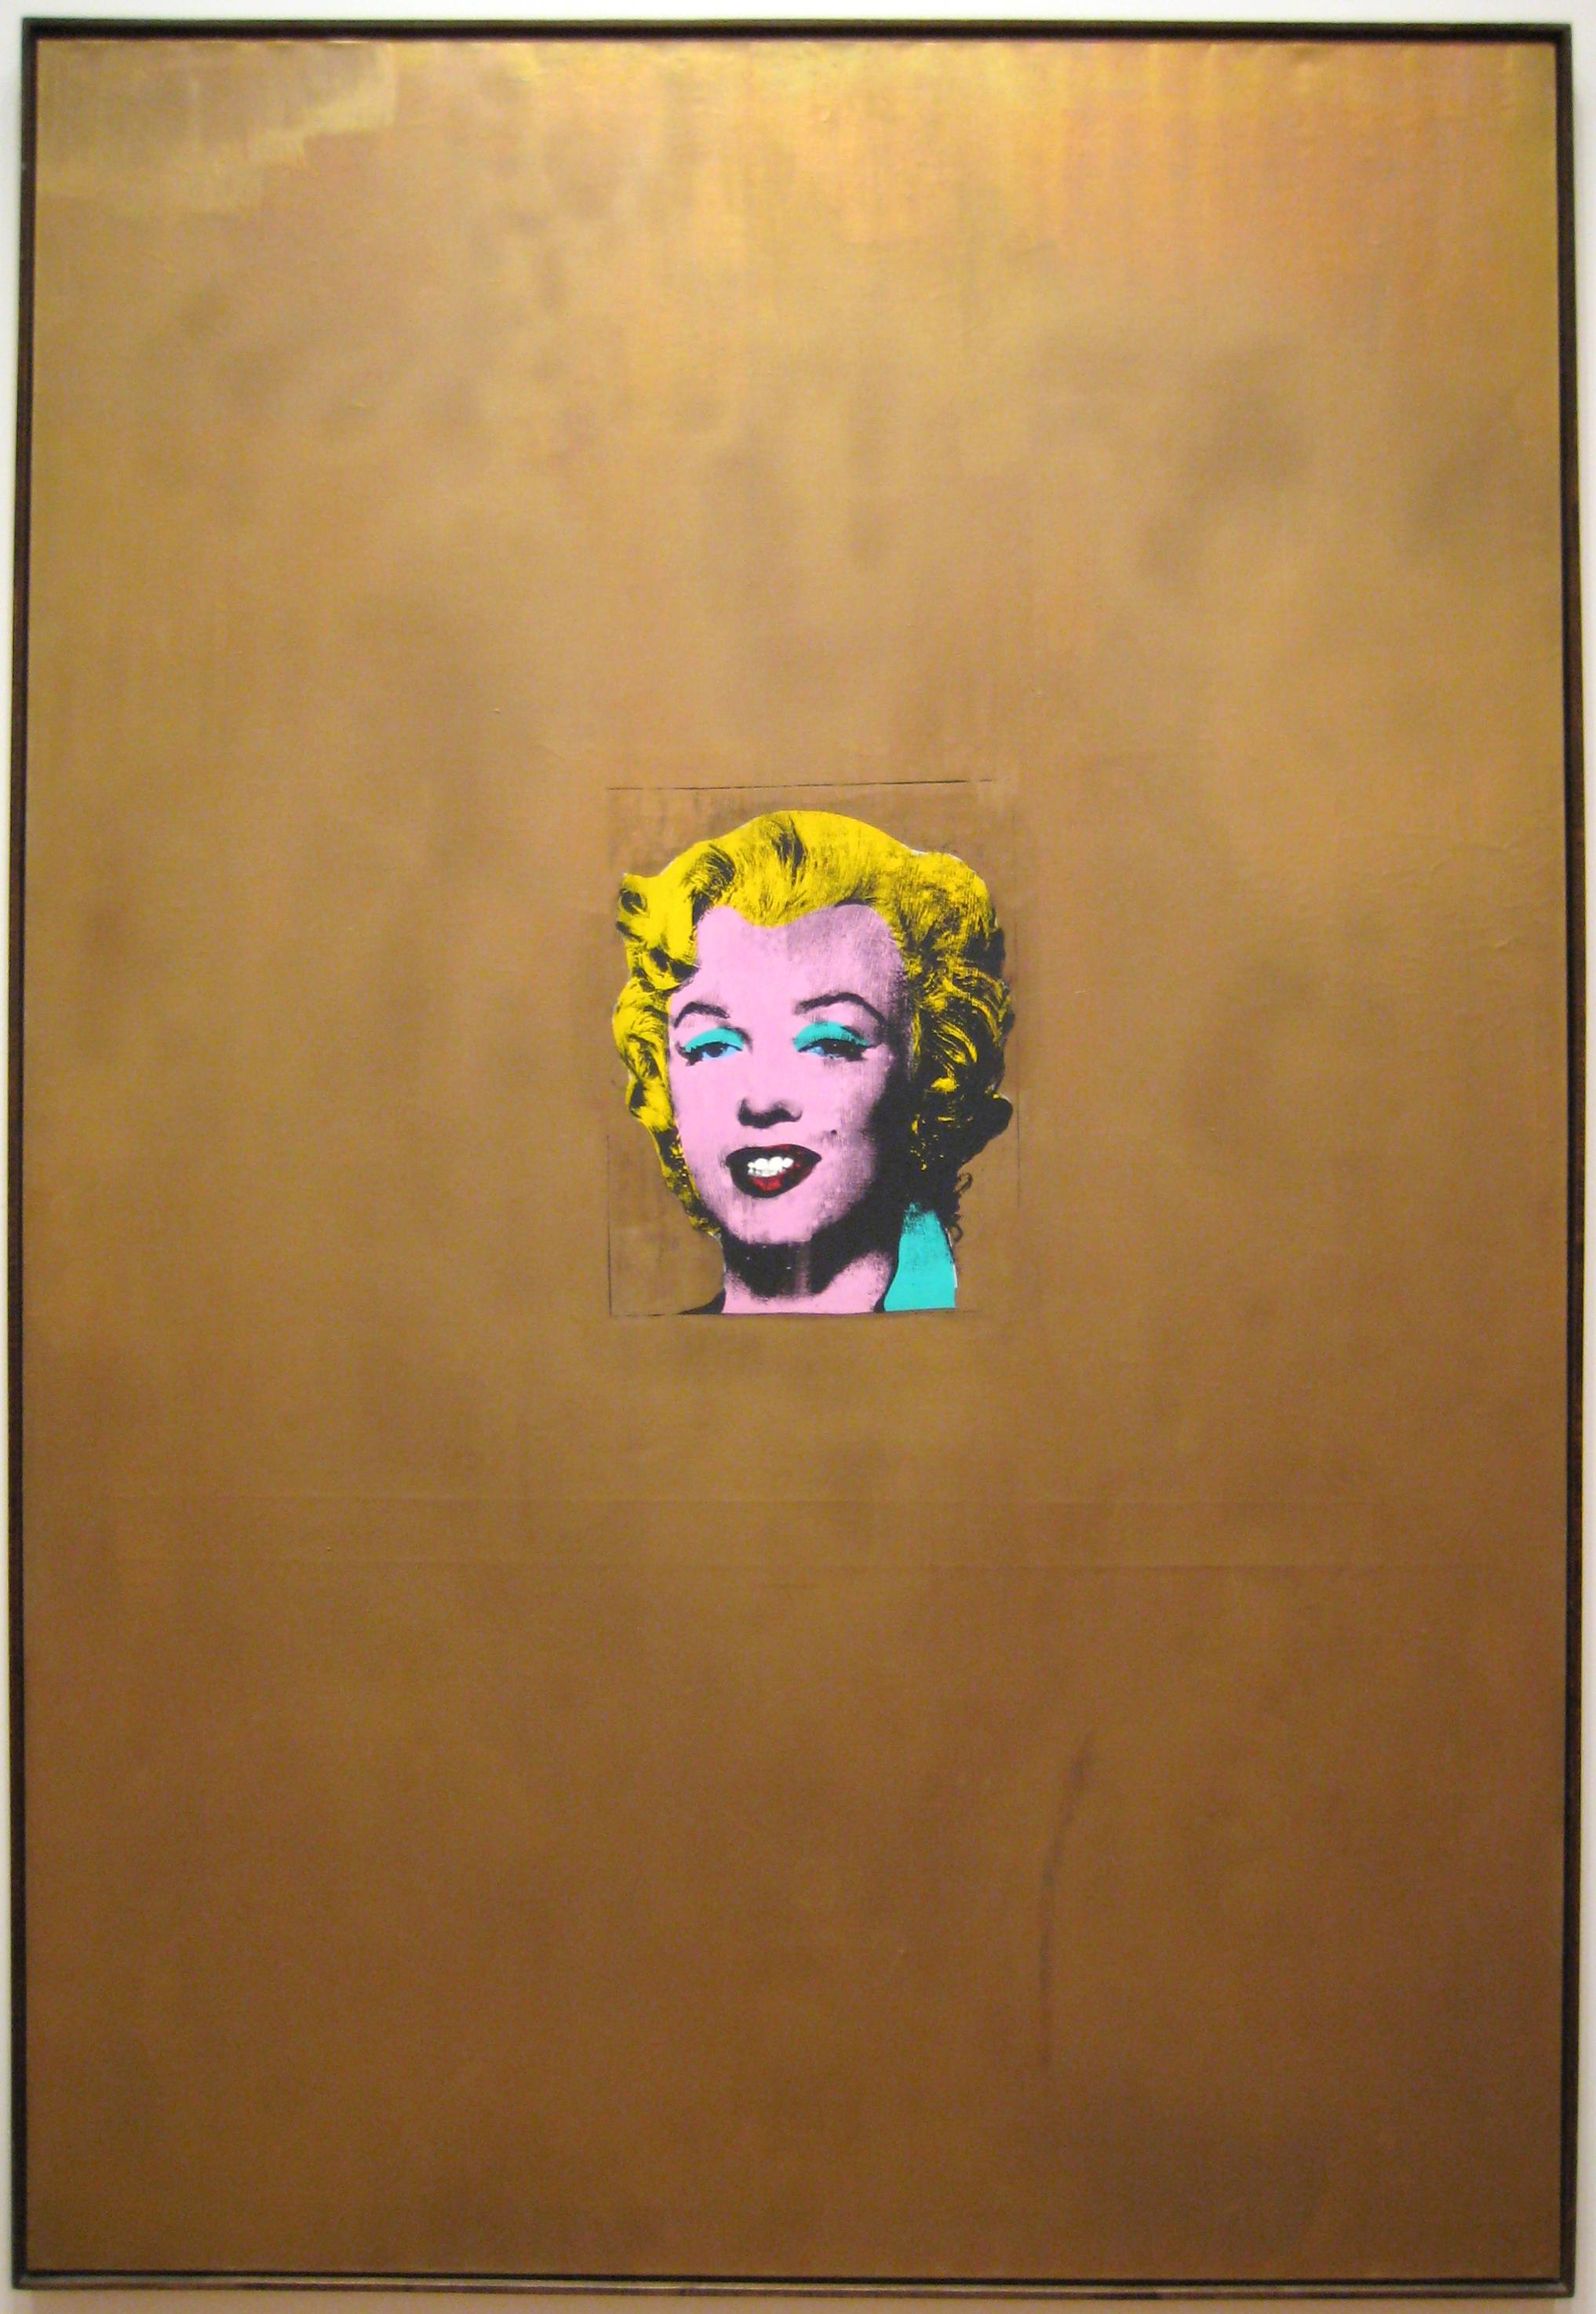 Andy Warhol: Gold Marilyn Monroe (1962)